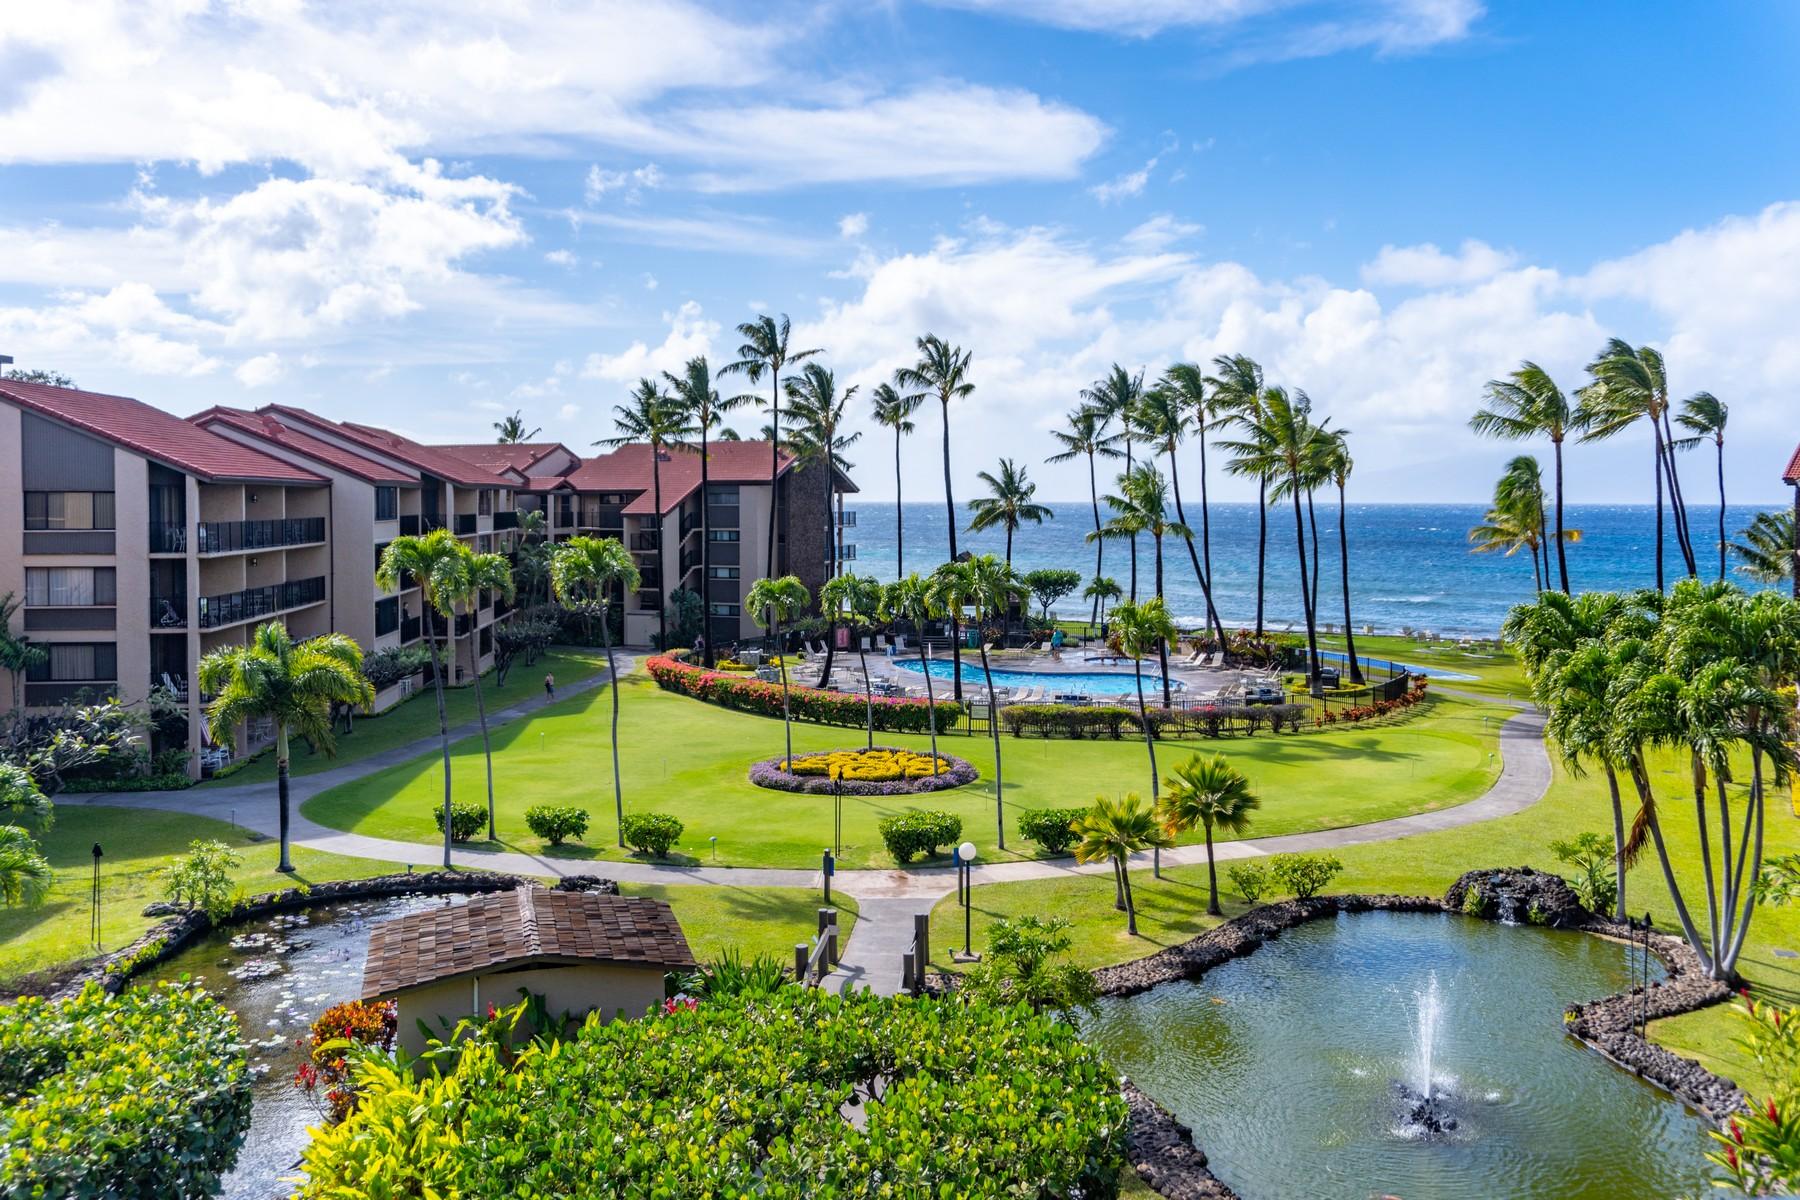 Condominiums for Sale at Island Paradise 3543 L Honoapiilani Rd, Papakea Resort H405 Honokowai, Hawaii 96761 United States